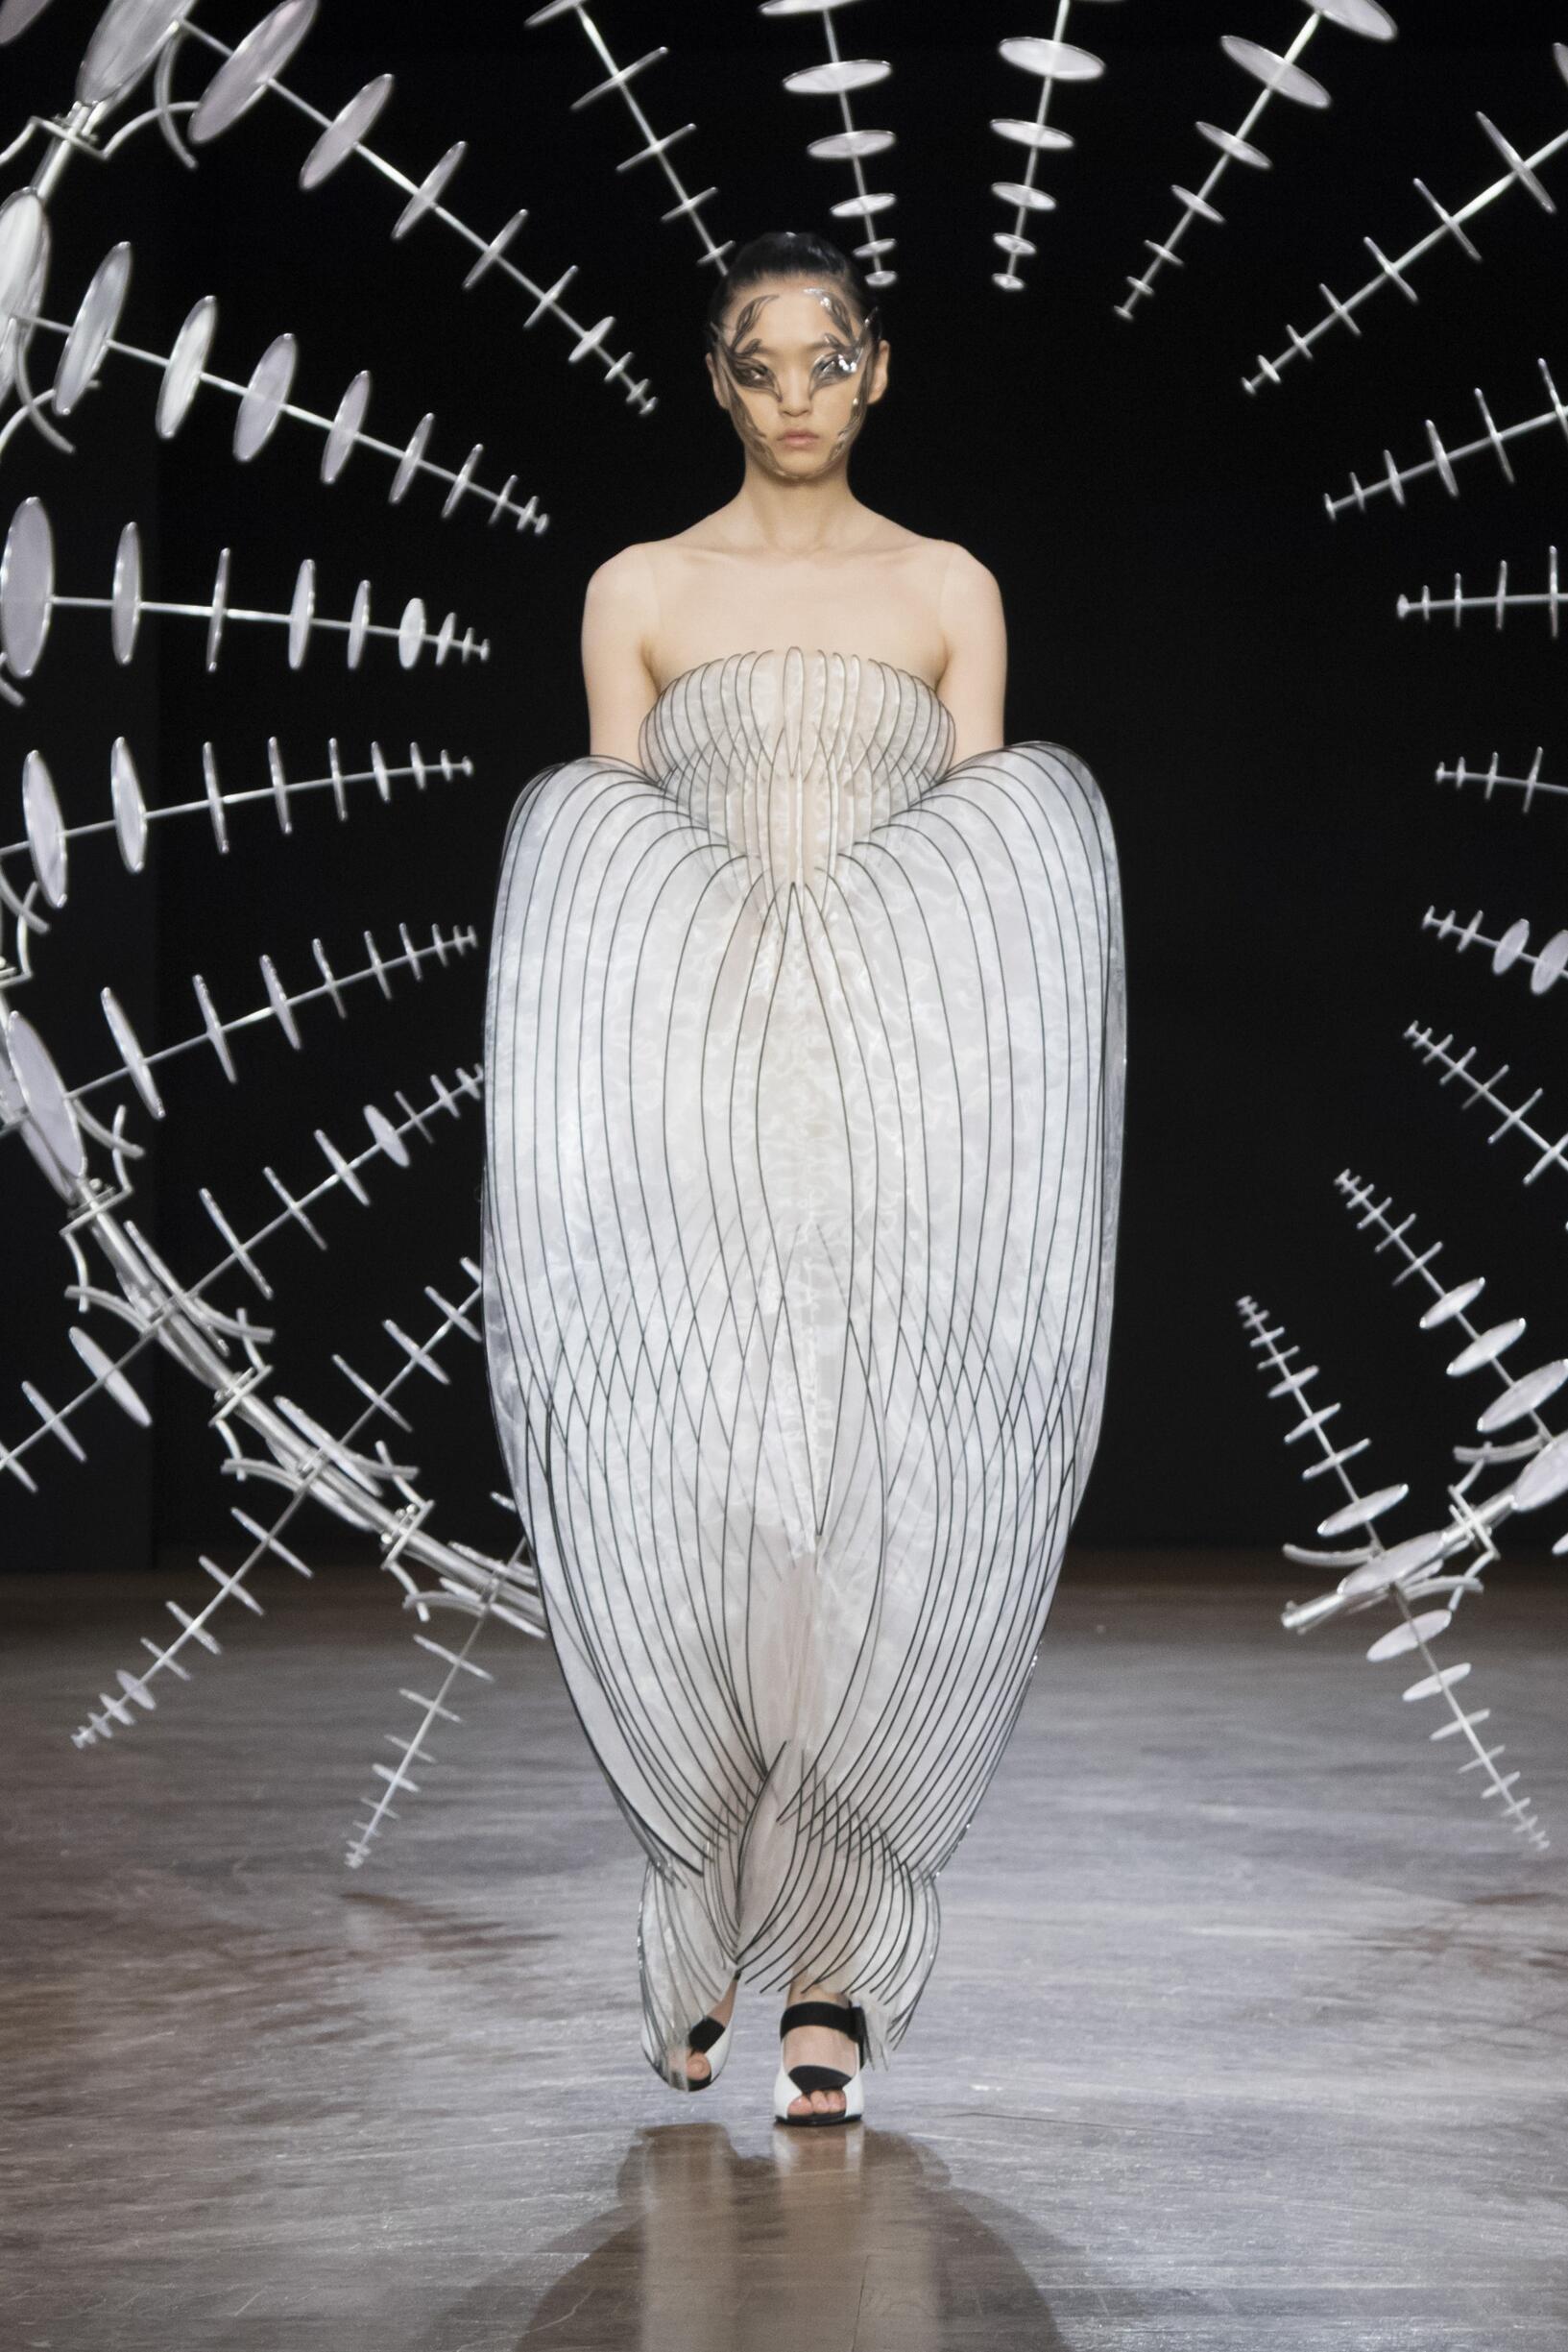 FW 2019-20 Iris van Herpen Haute Couture Fashion Show